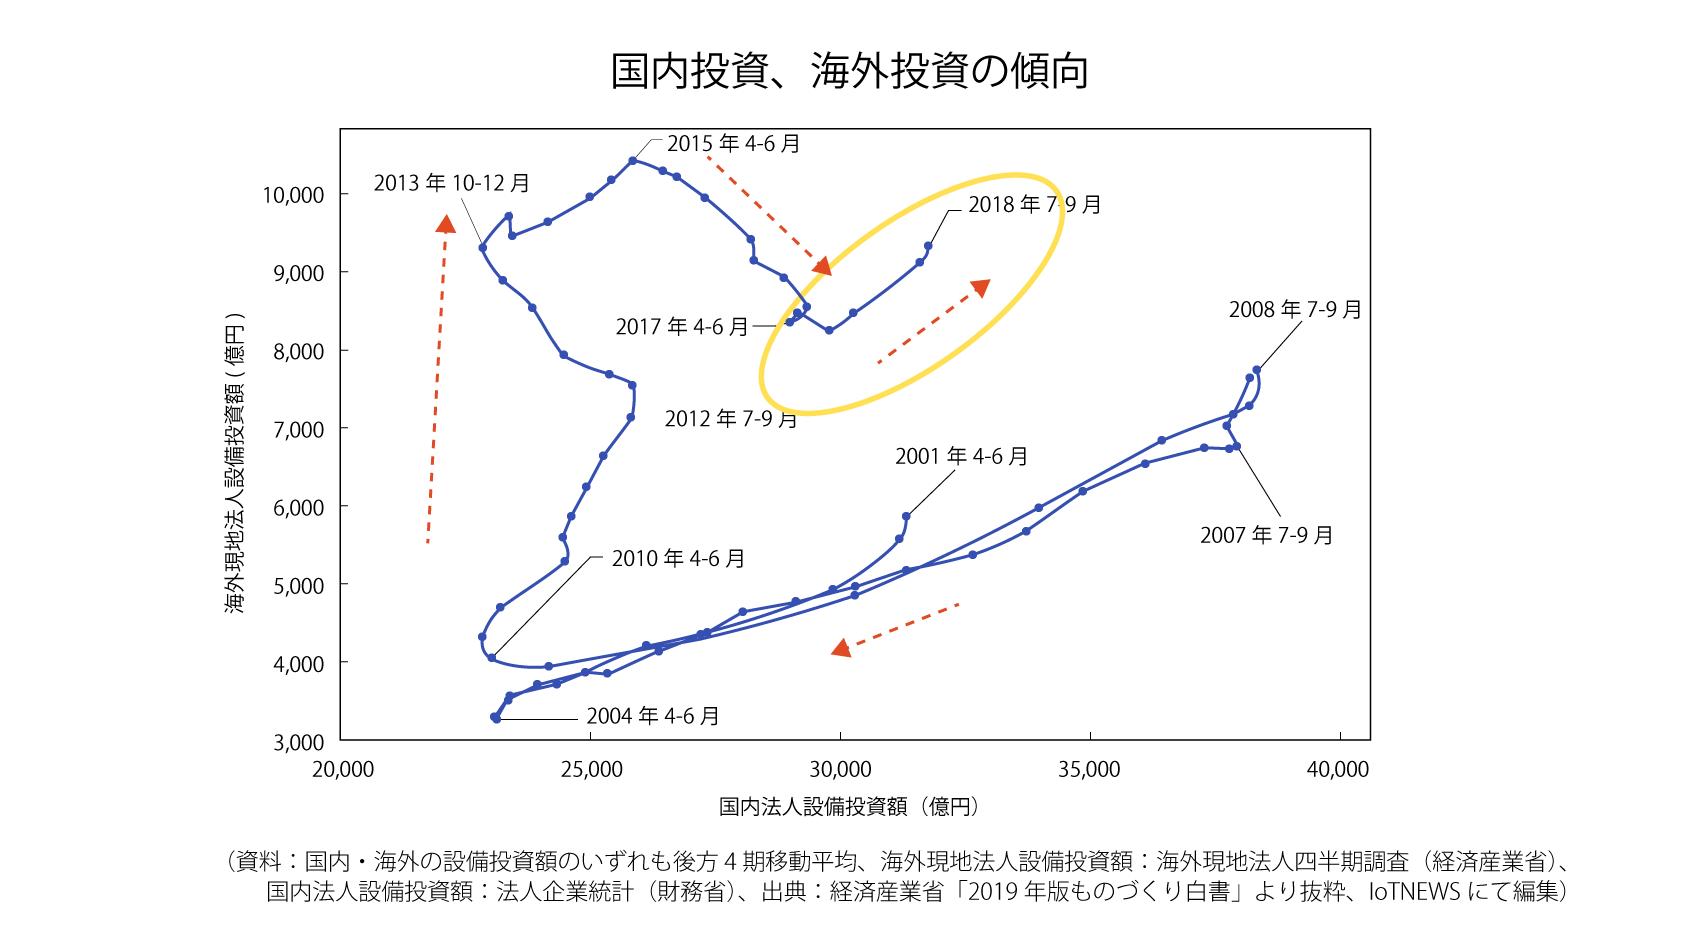 国内投資、海外投資の傾向